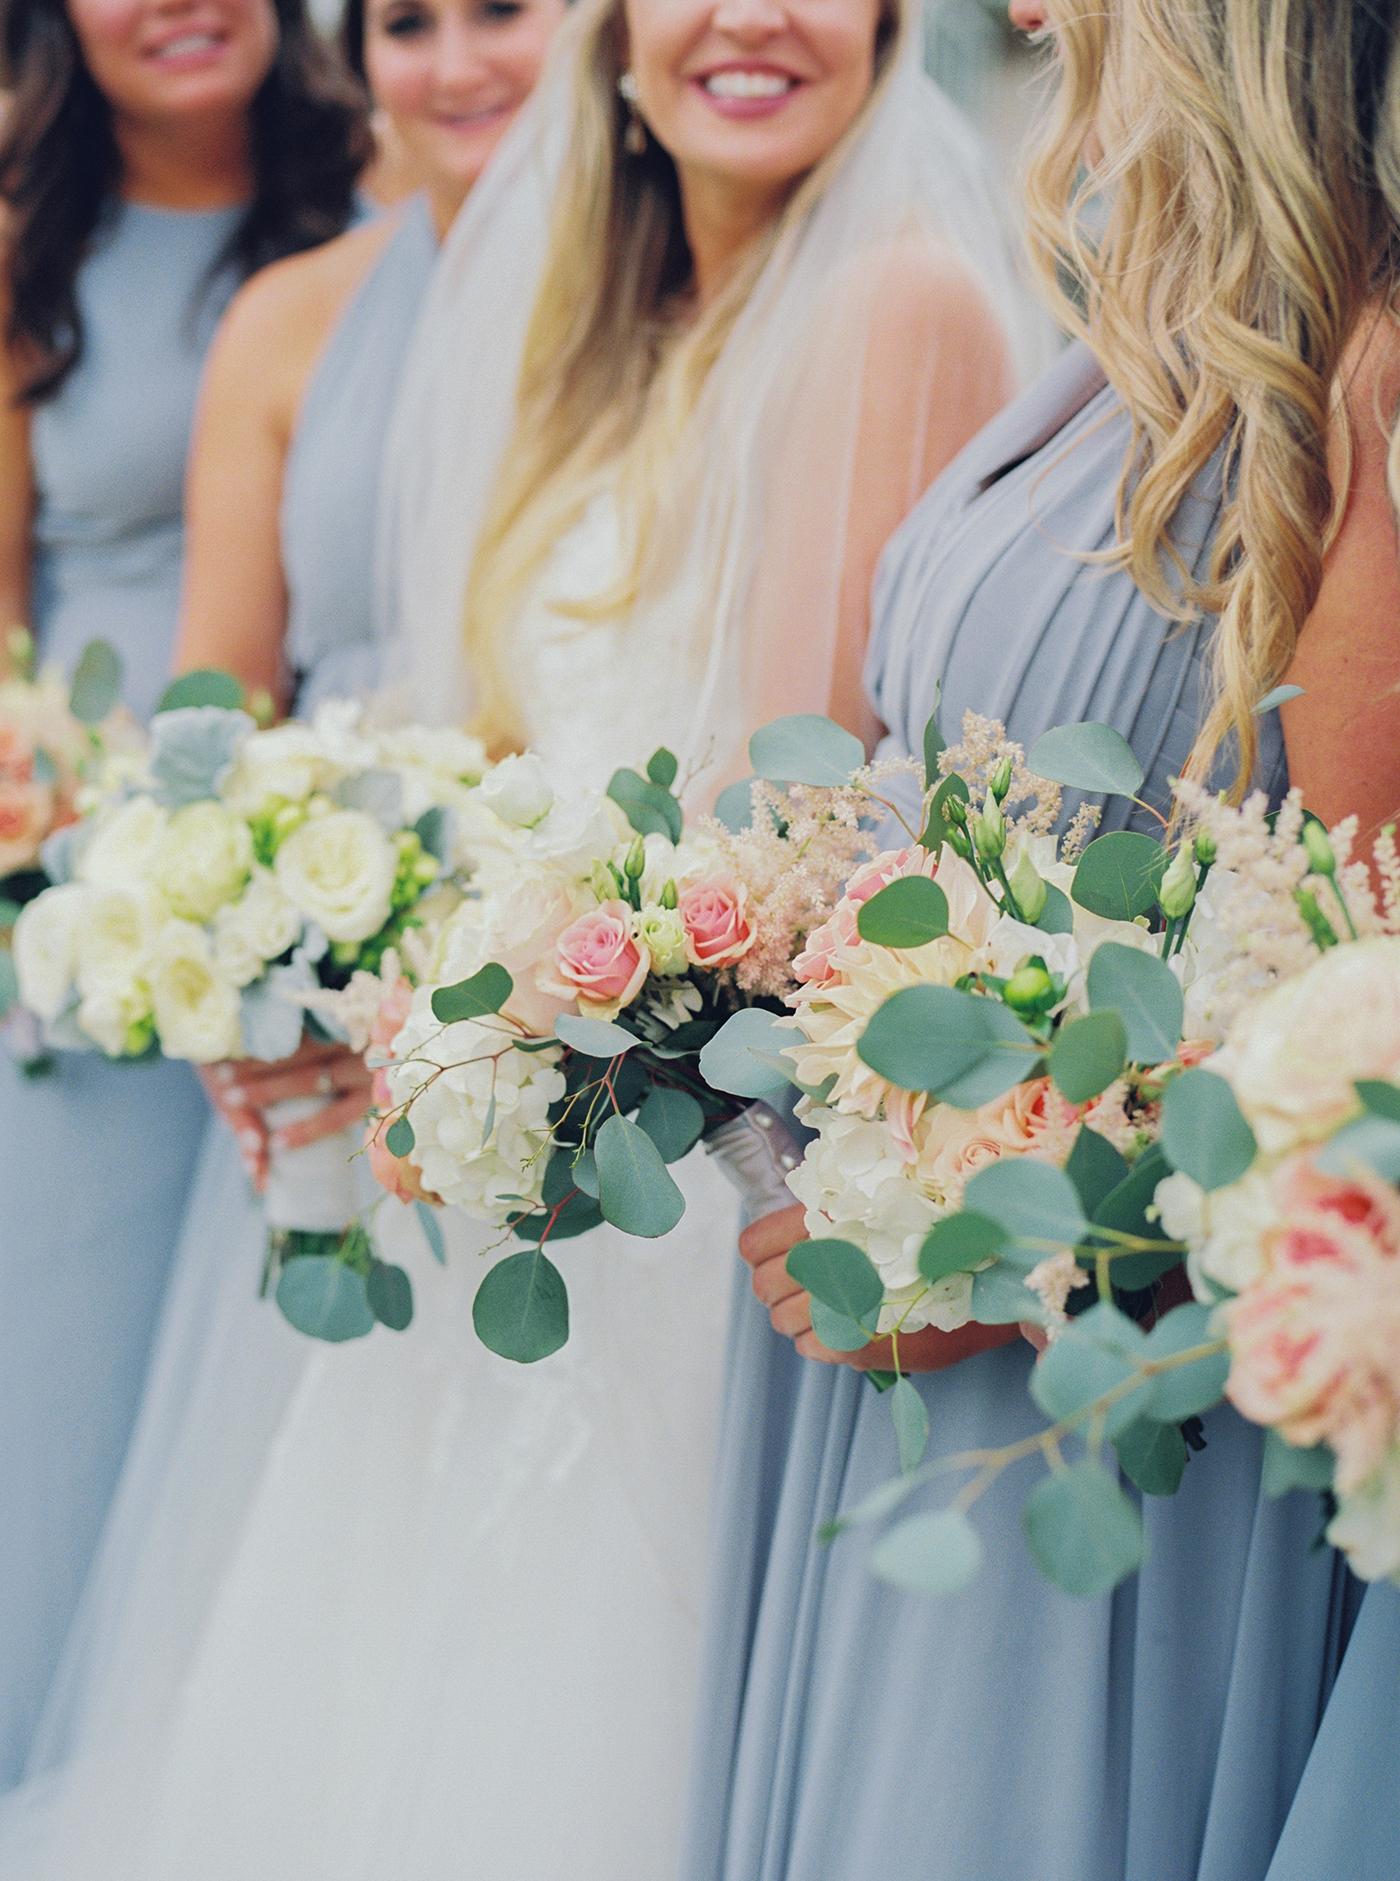 DFW Wedding Planner - Caroline + Jeff at The Four Seasons Hotel Wedding - Allday Events - 48.jpg